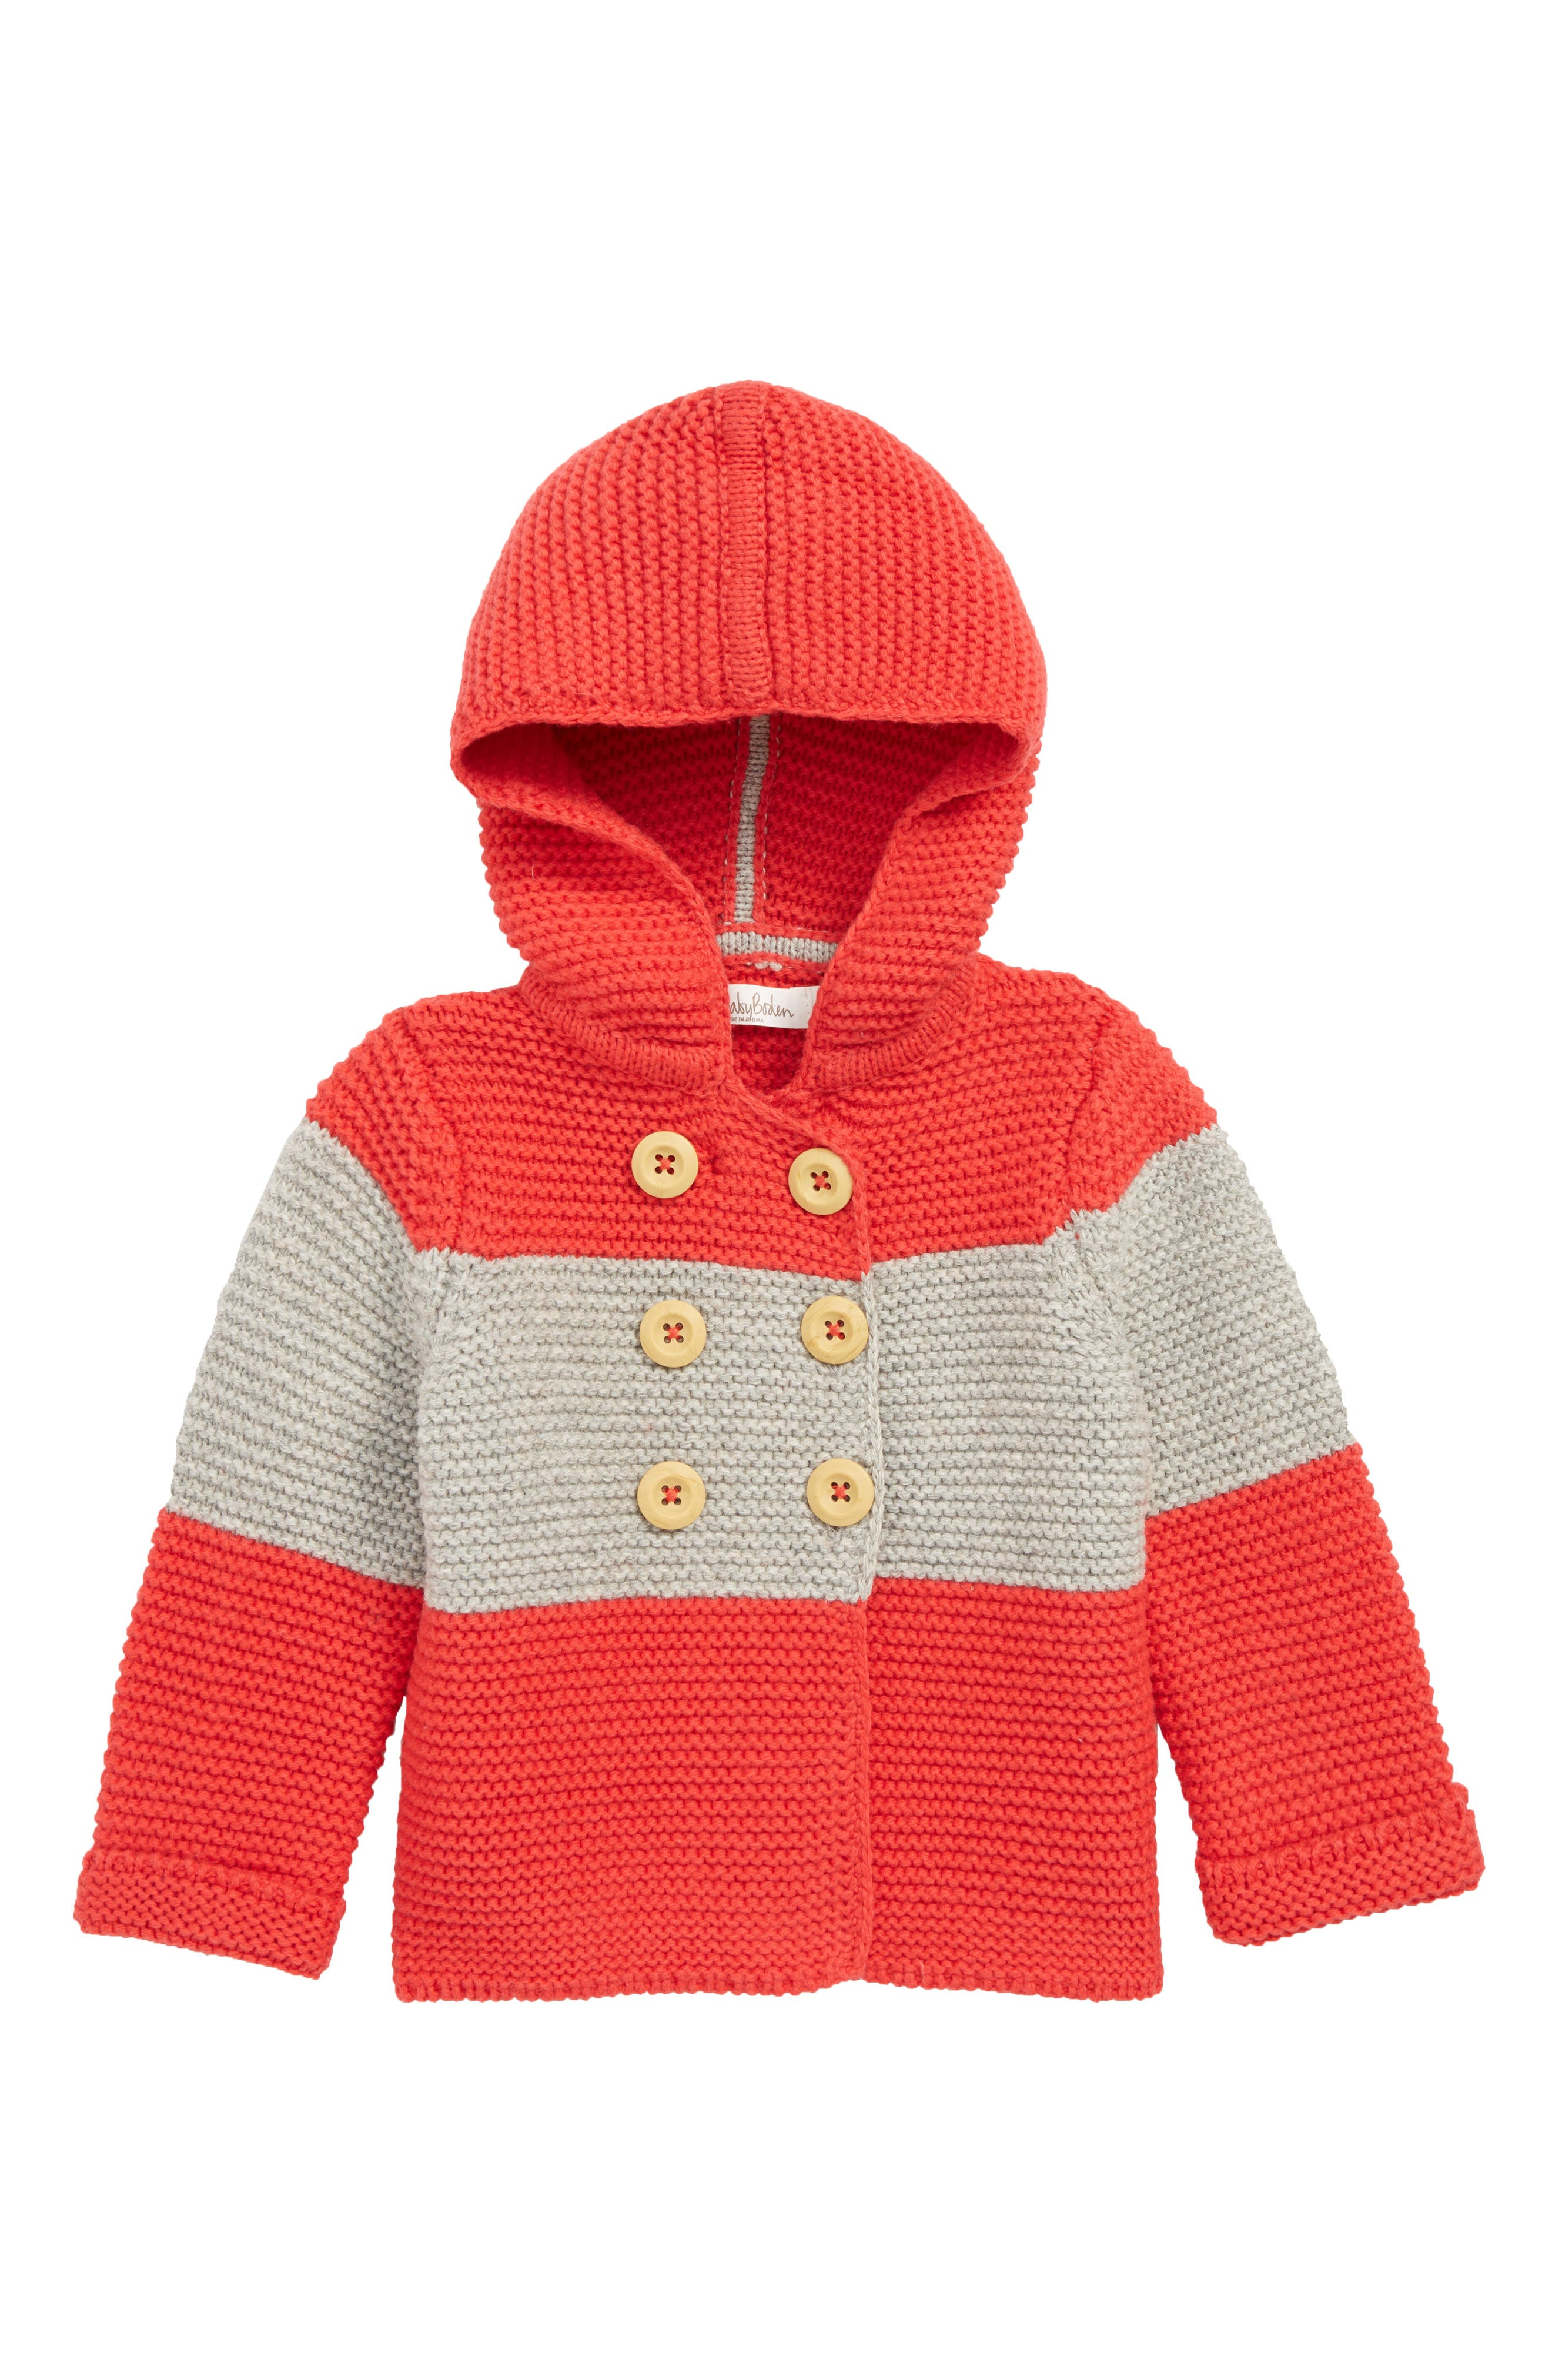 MINI BODEN, Colorblock Knit Jacket, Main thumbnail 1, color, 614